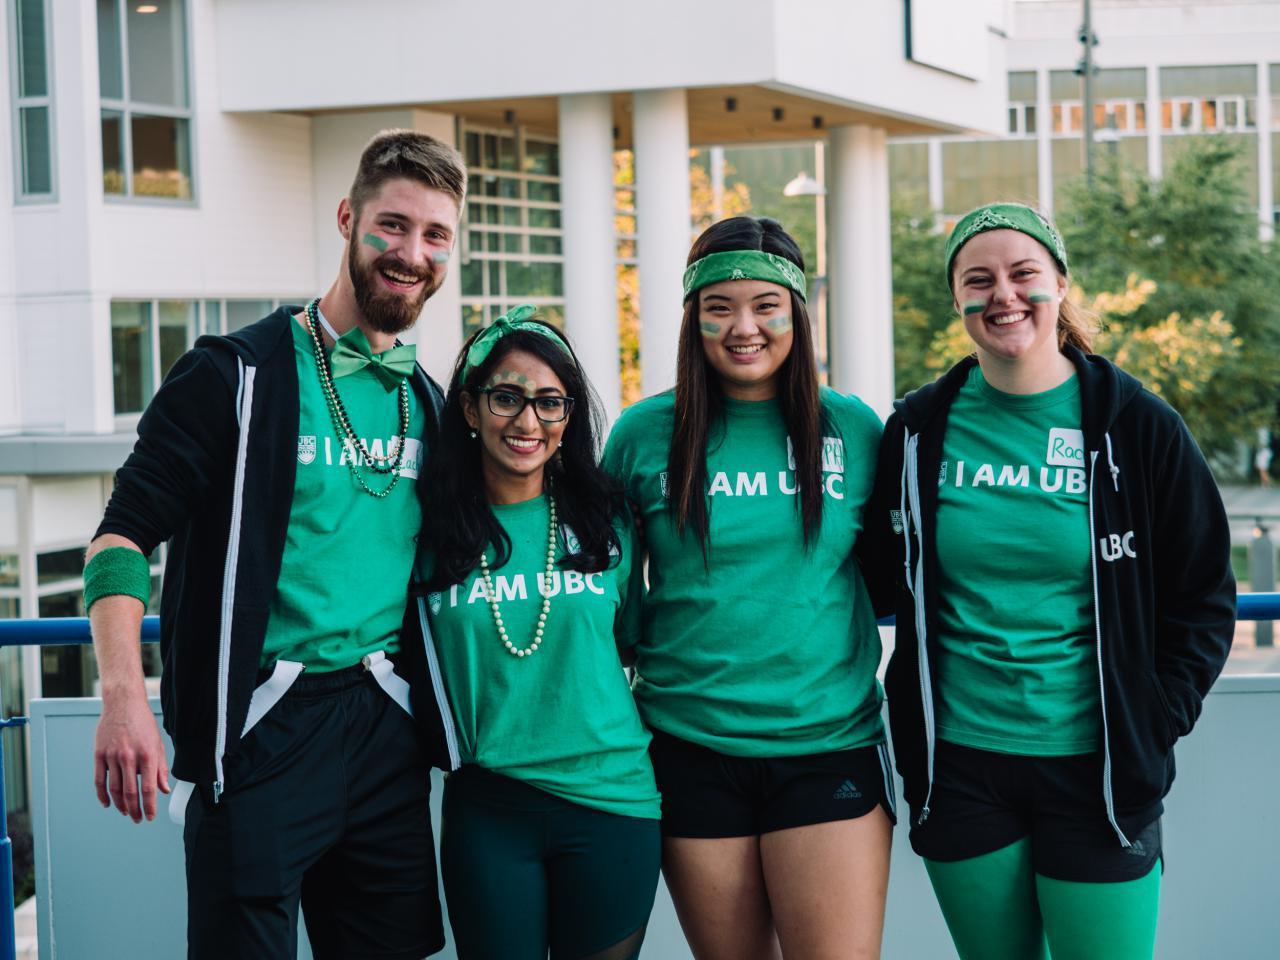 UBC-Imagine-Day-2018-Kinesiology-6.jpg